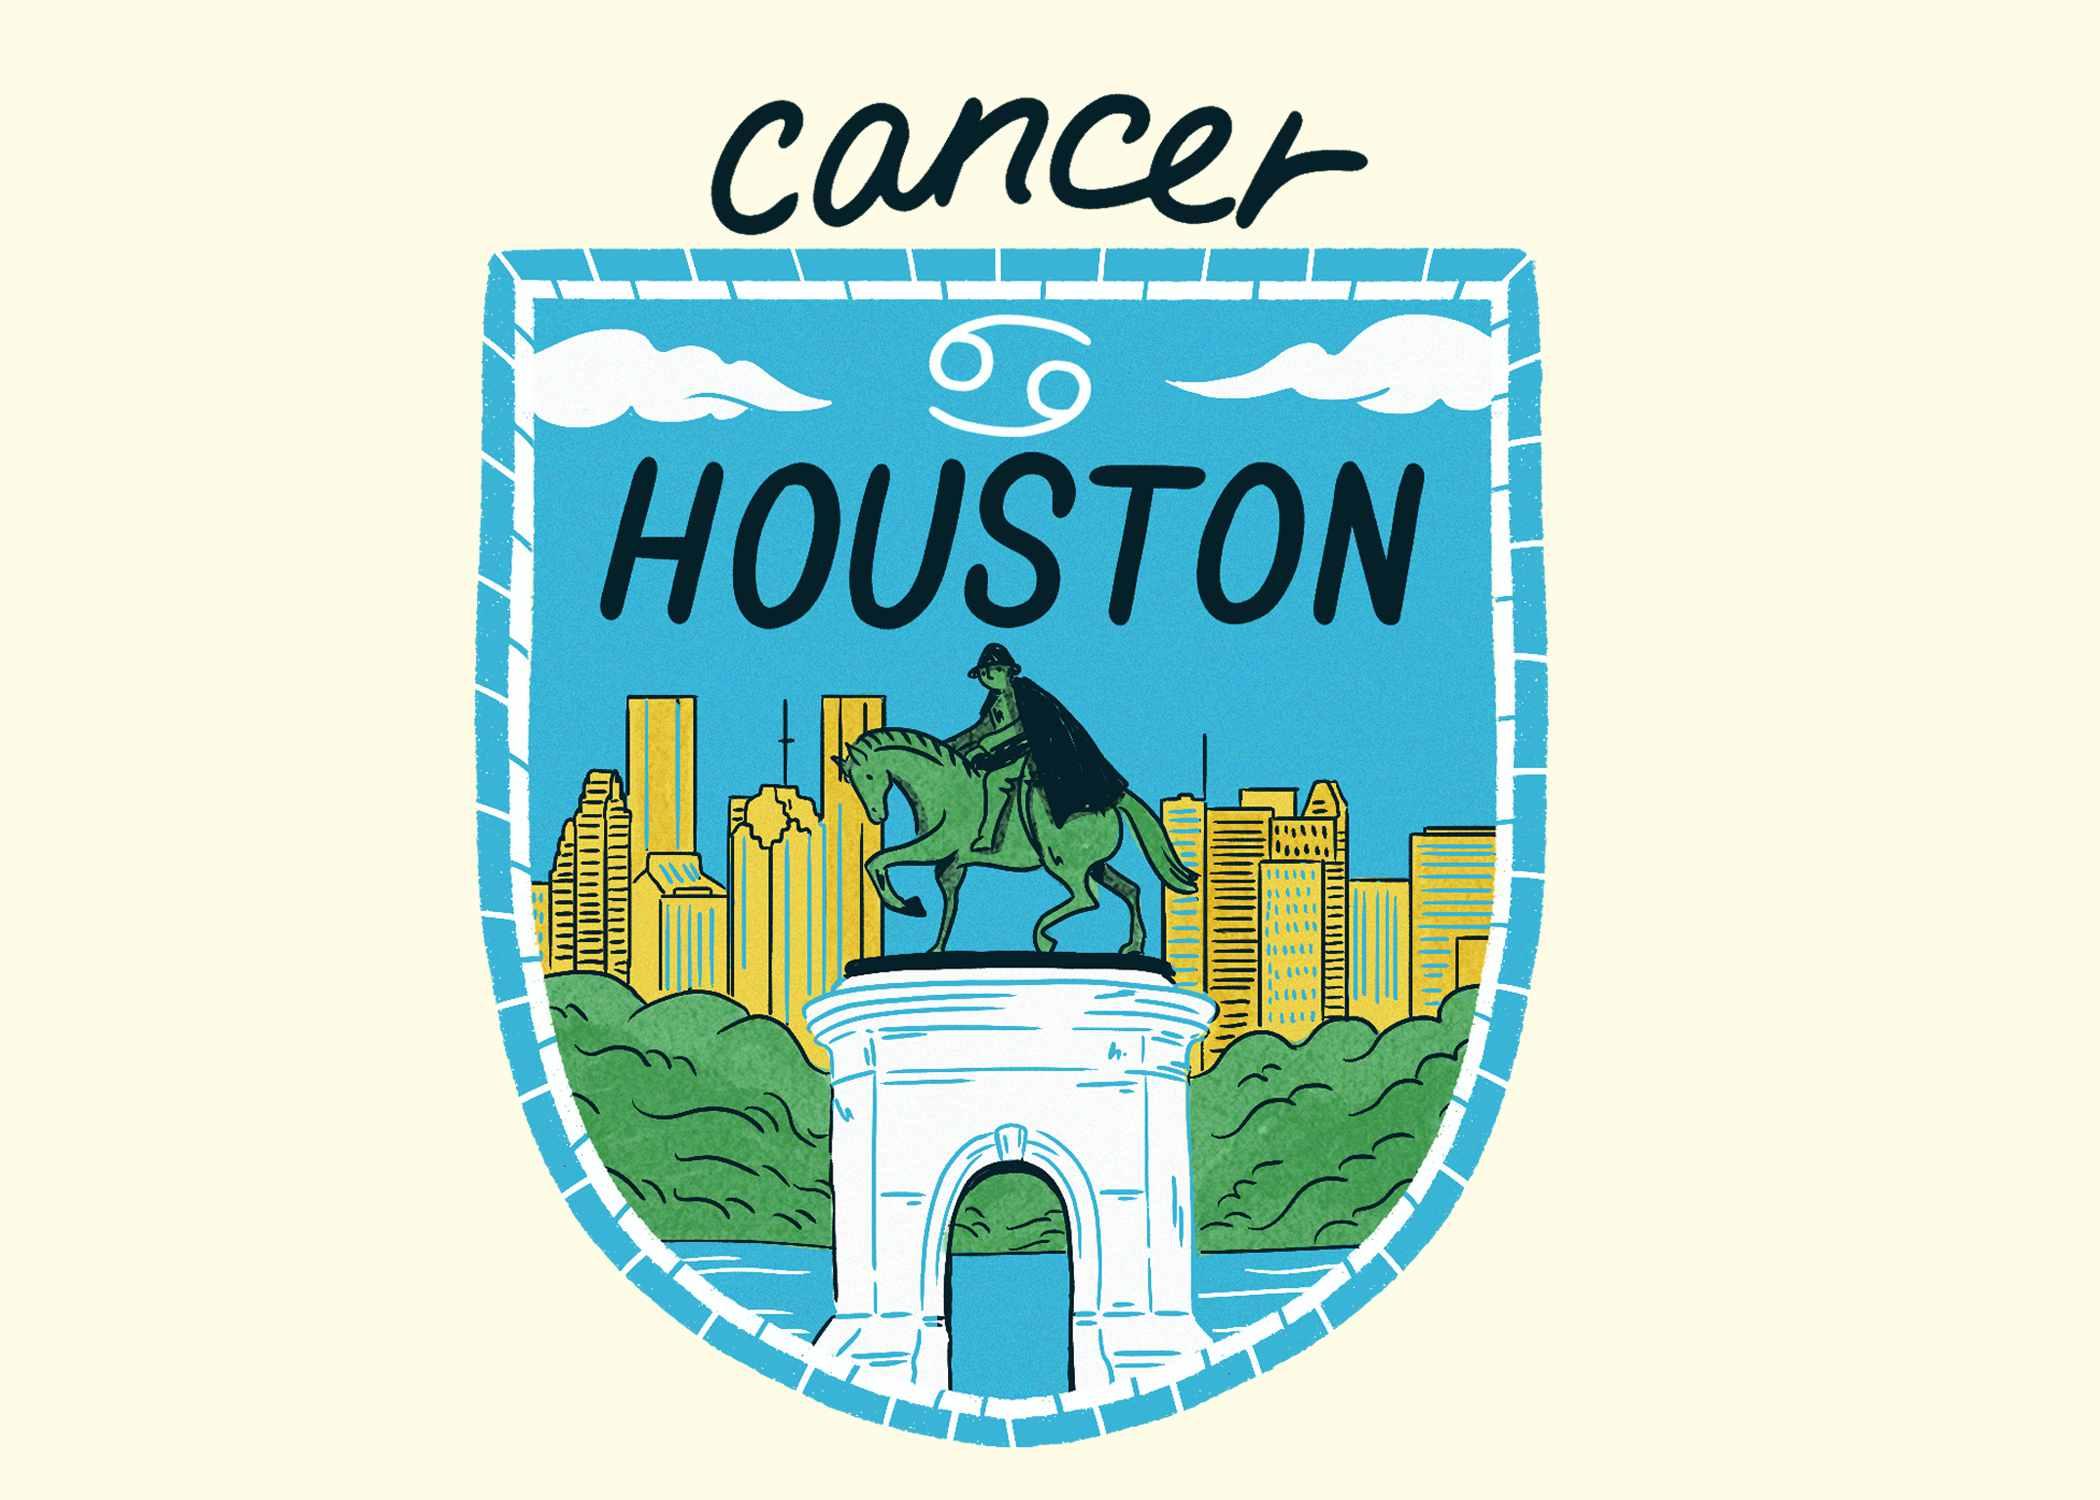 An illustration of Houston for Cancer